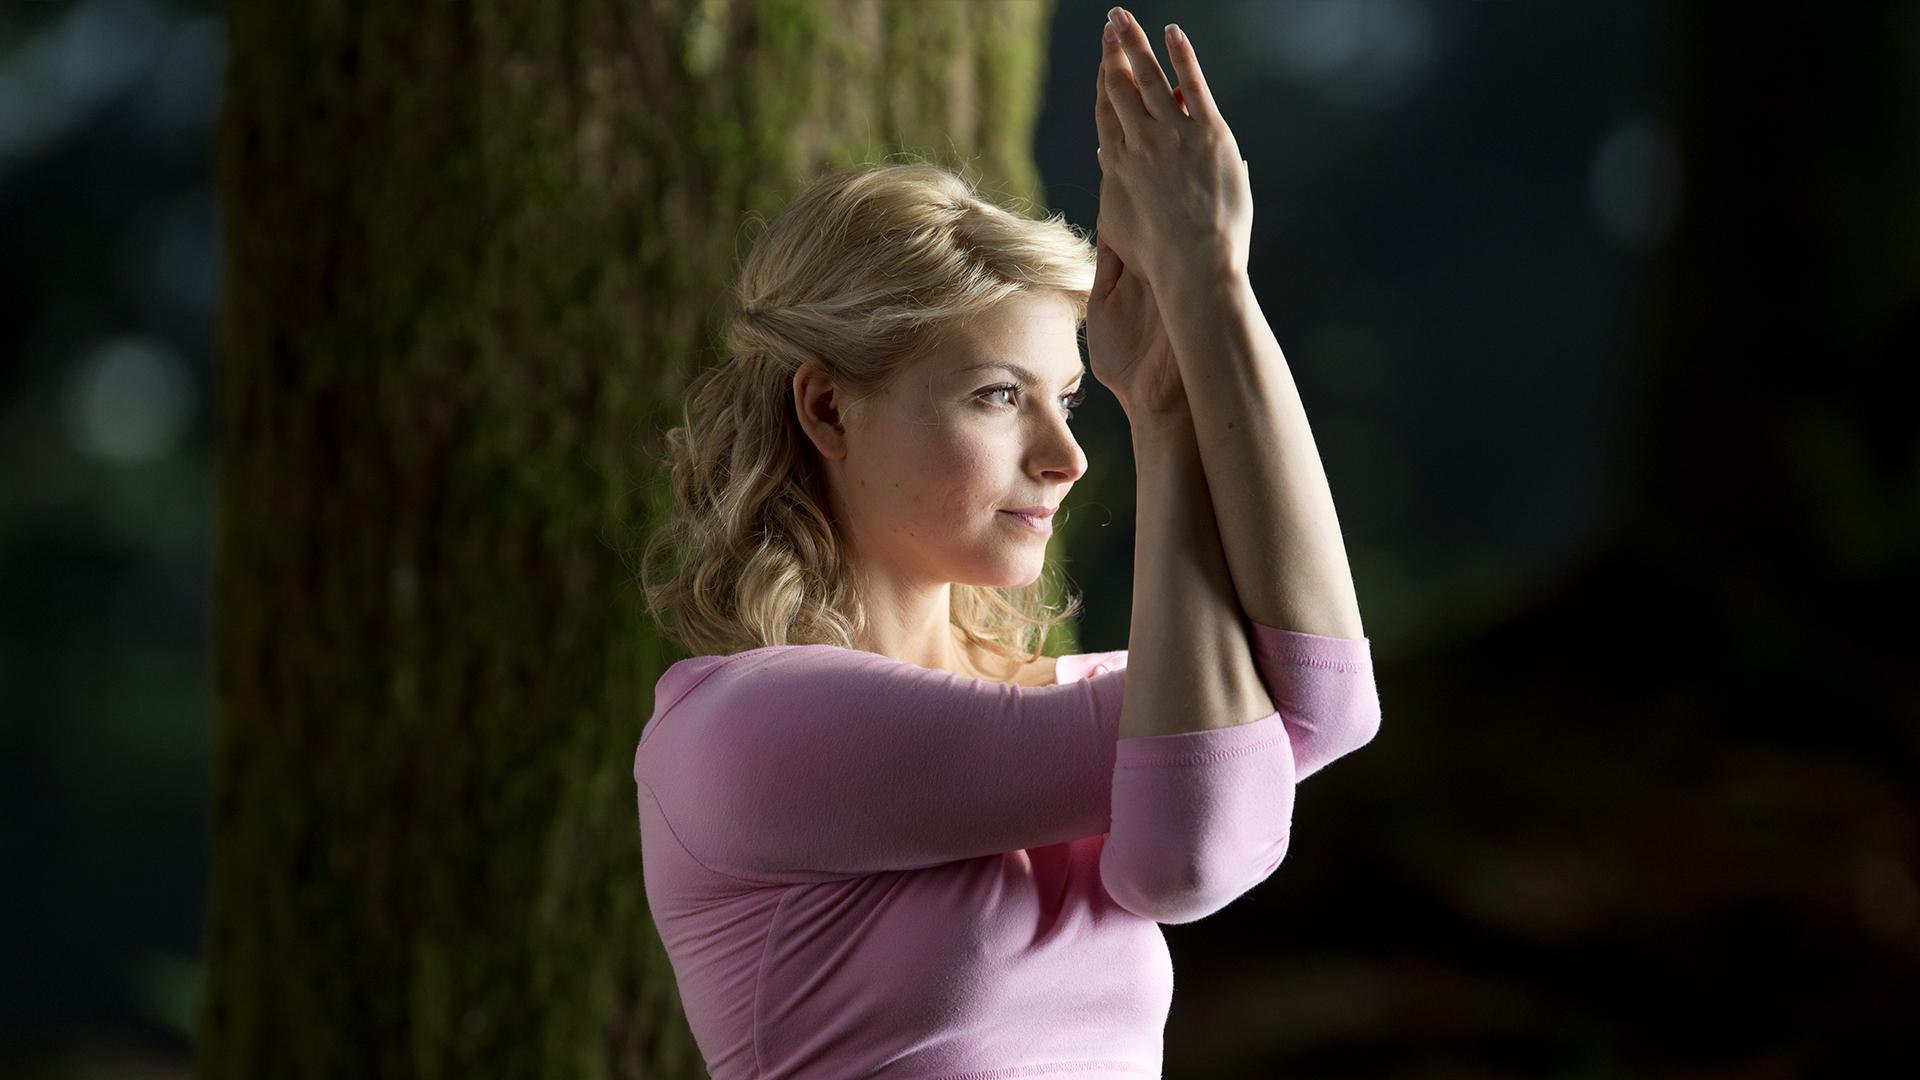 Namaste Yoga - Season 2